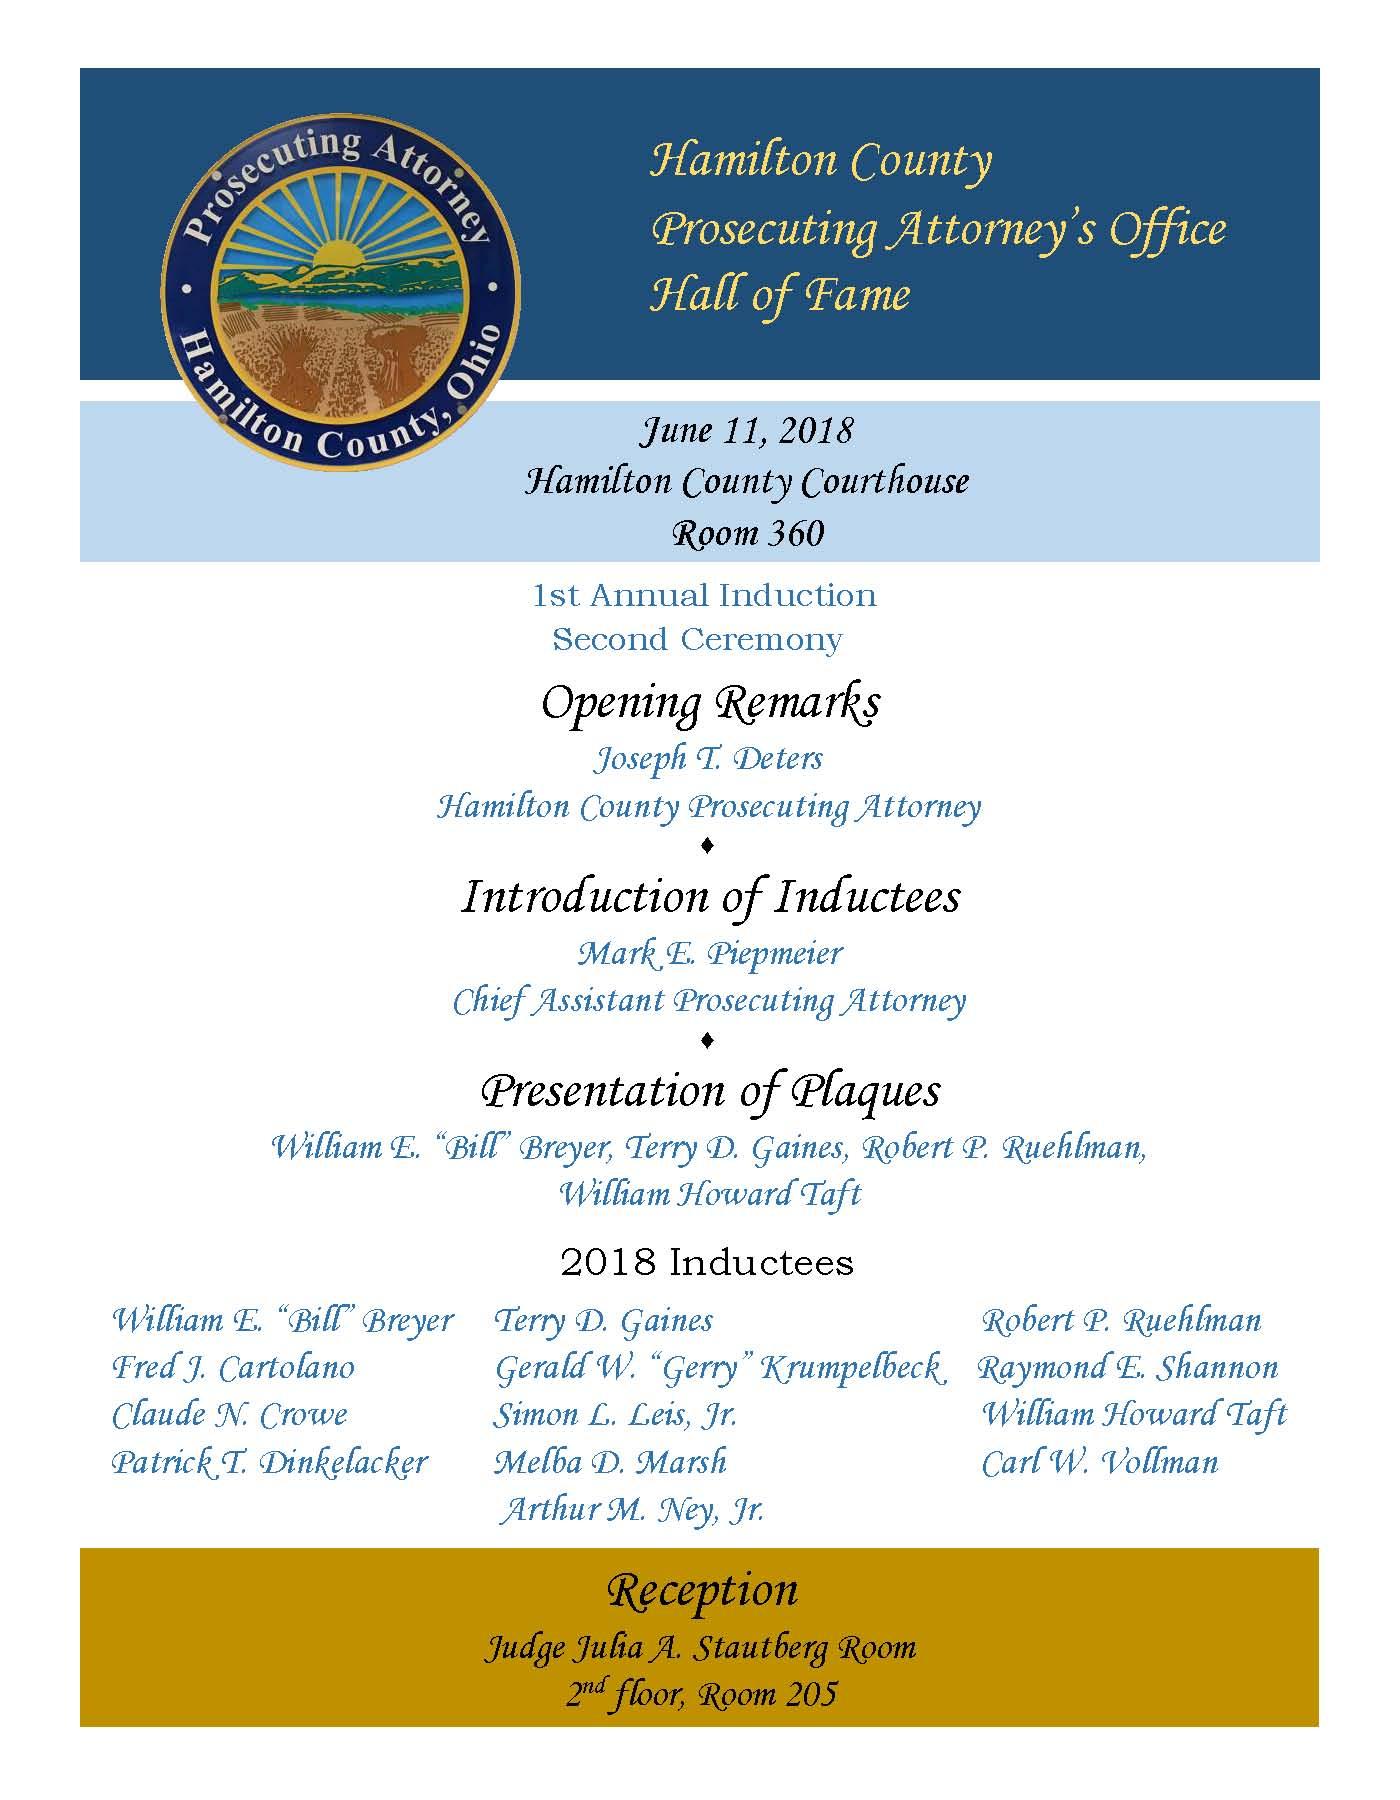 June 11, 2018 Prosecutors Hall of Fame